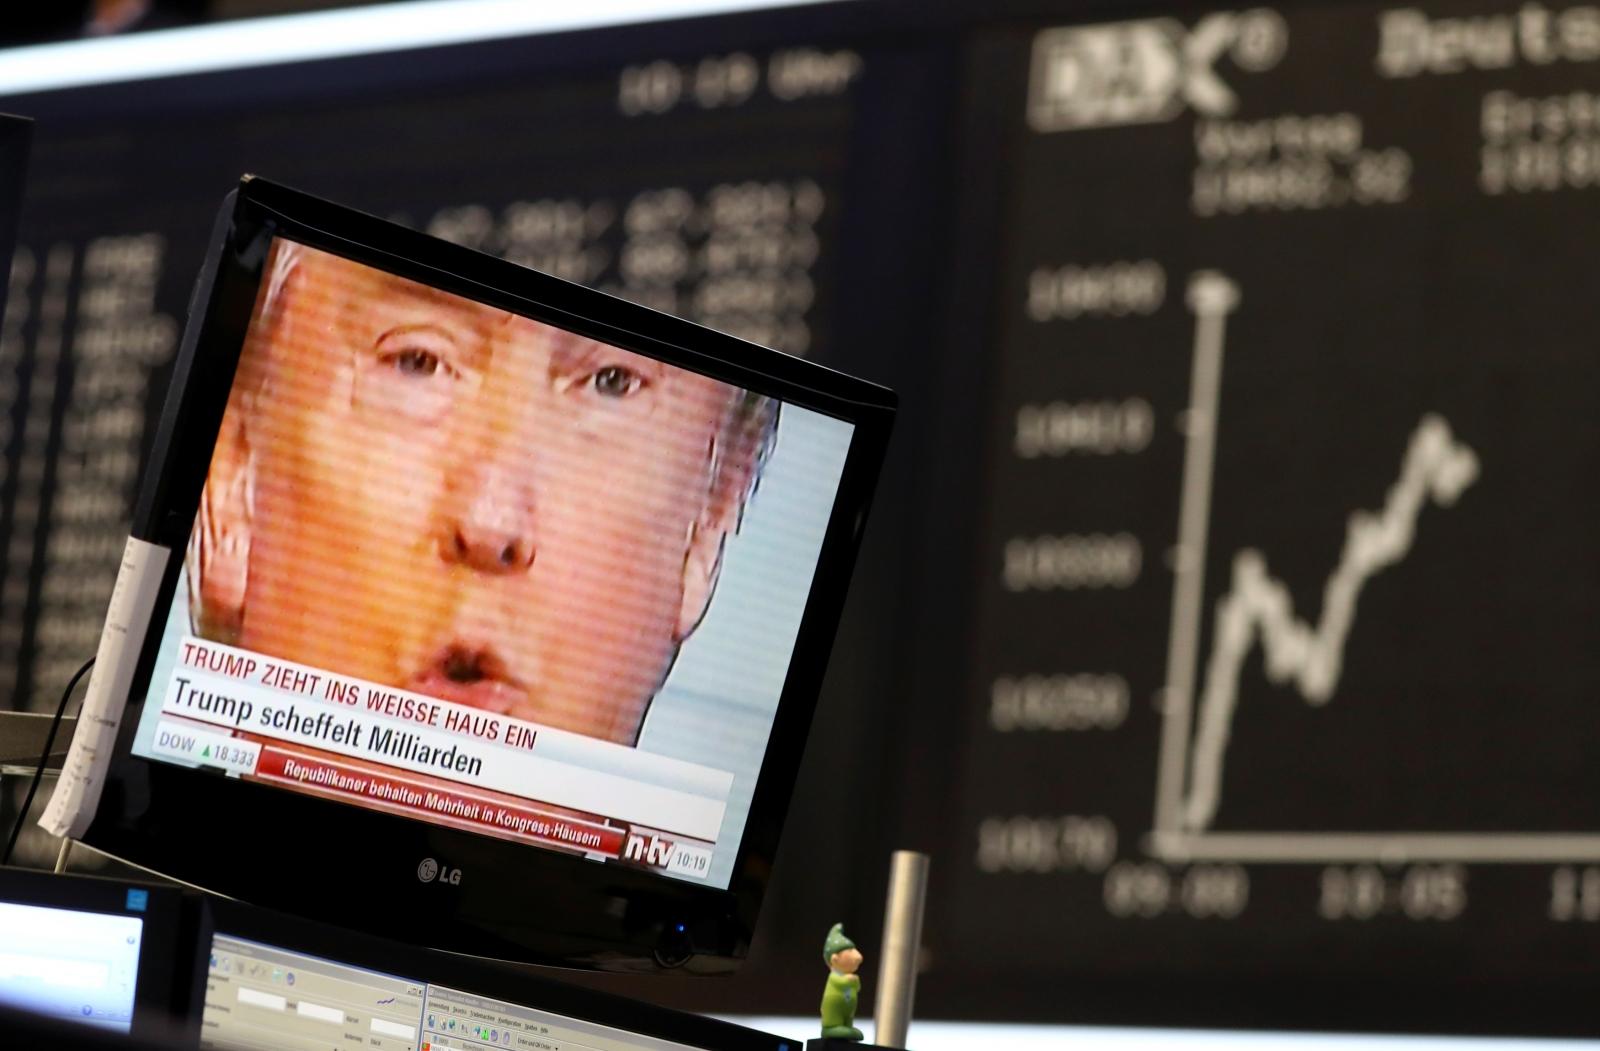 Donald Trump used big data to win